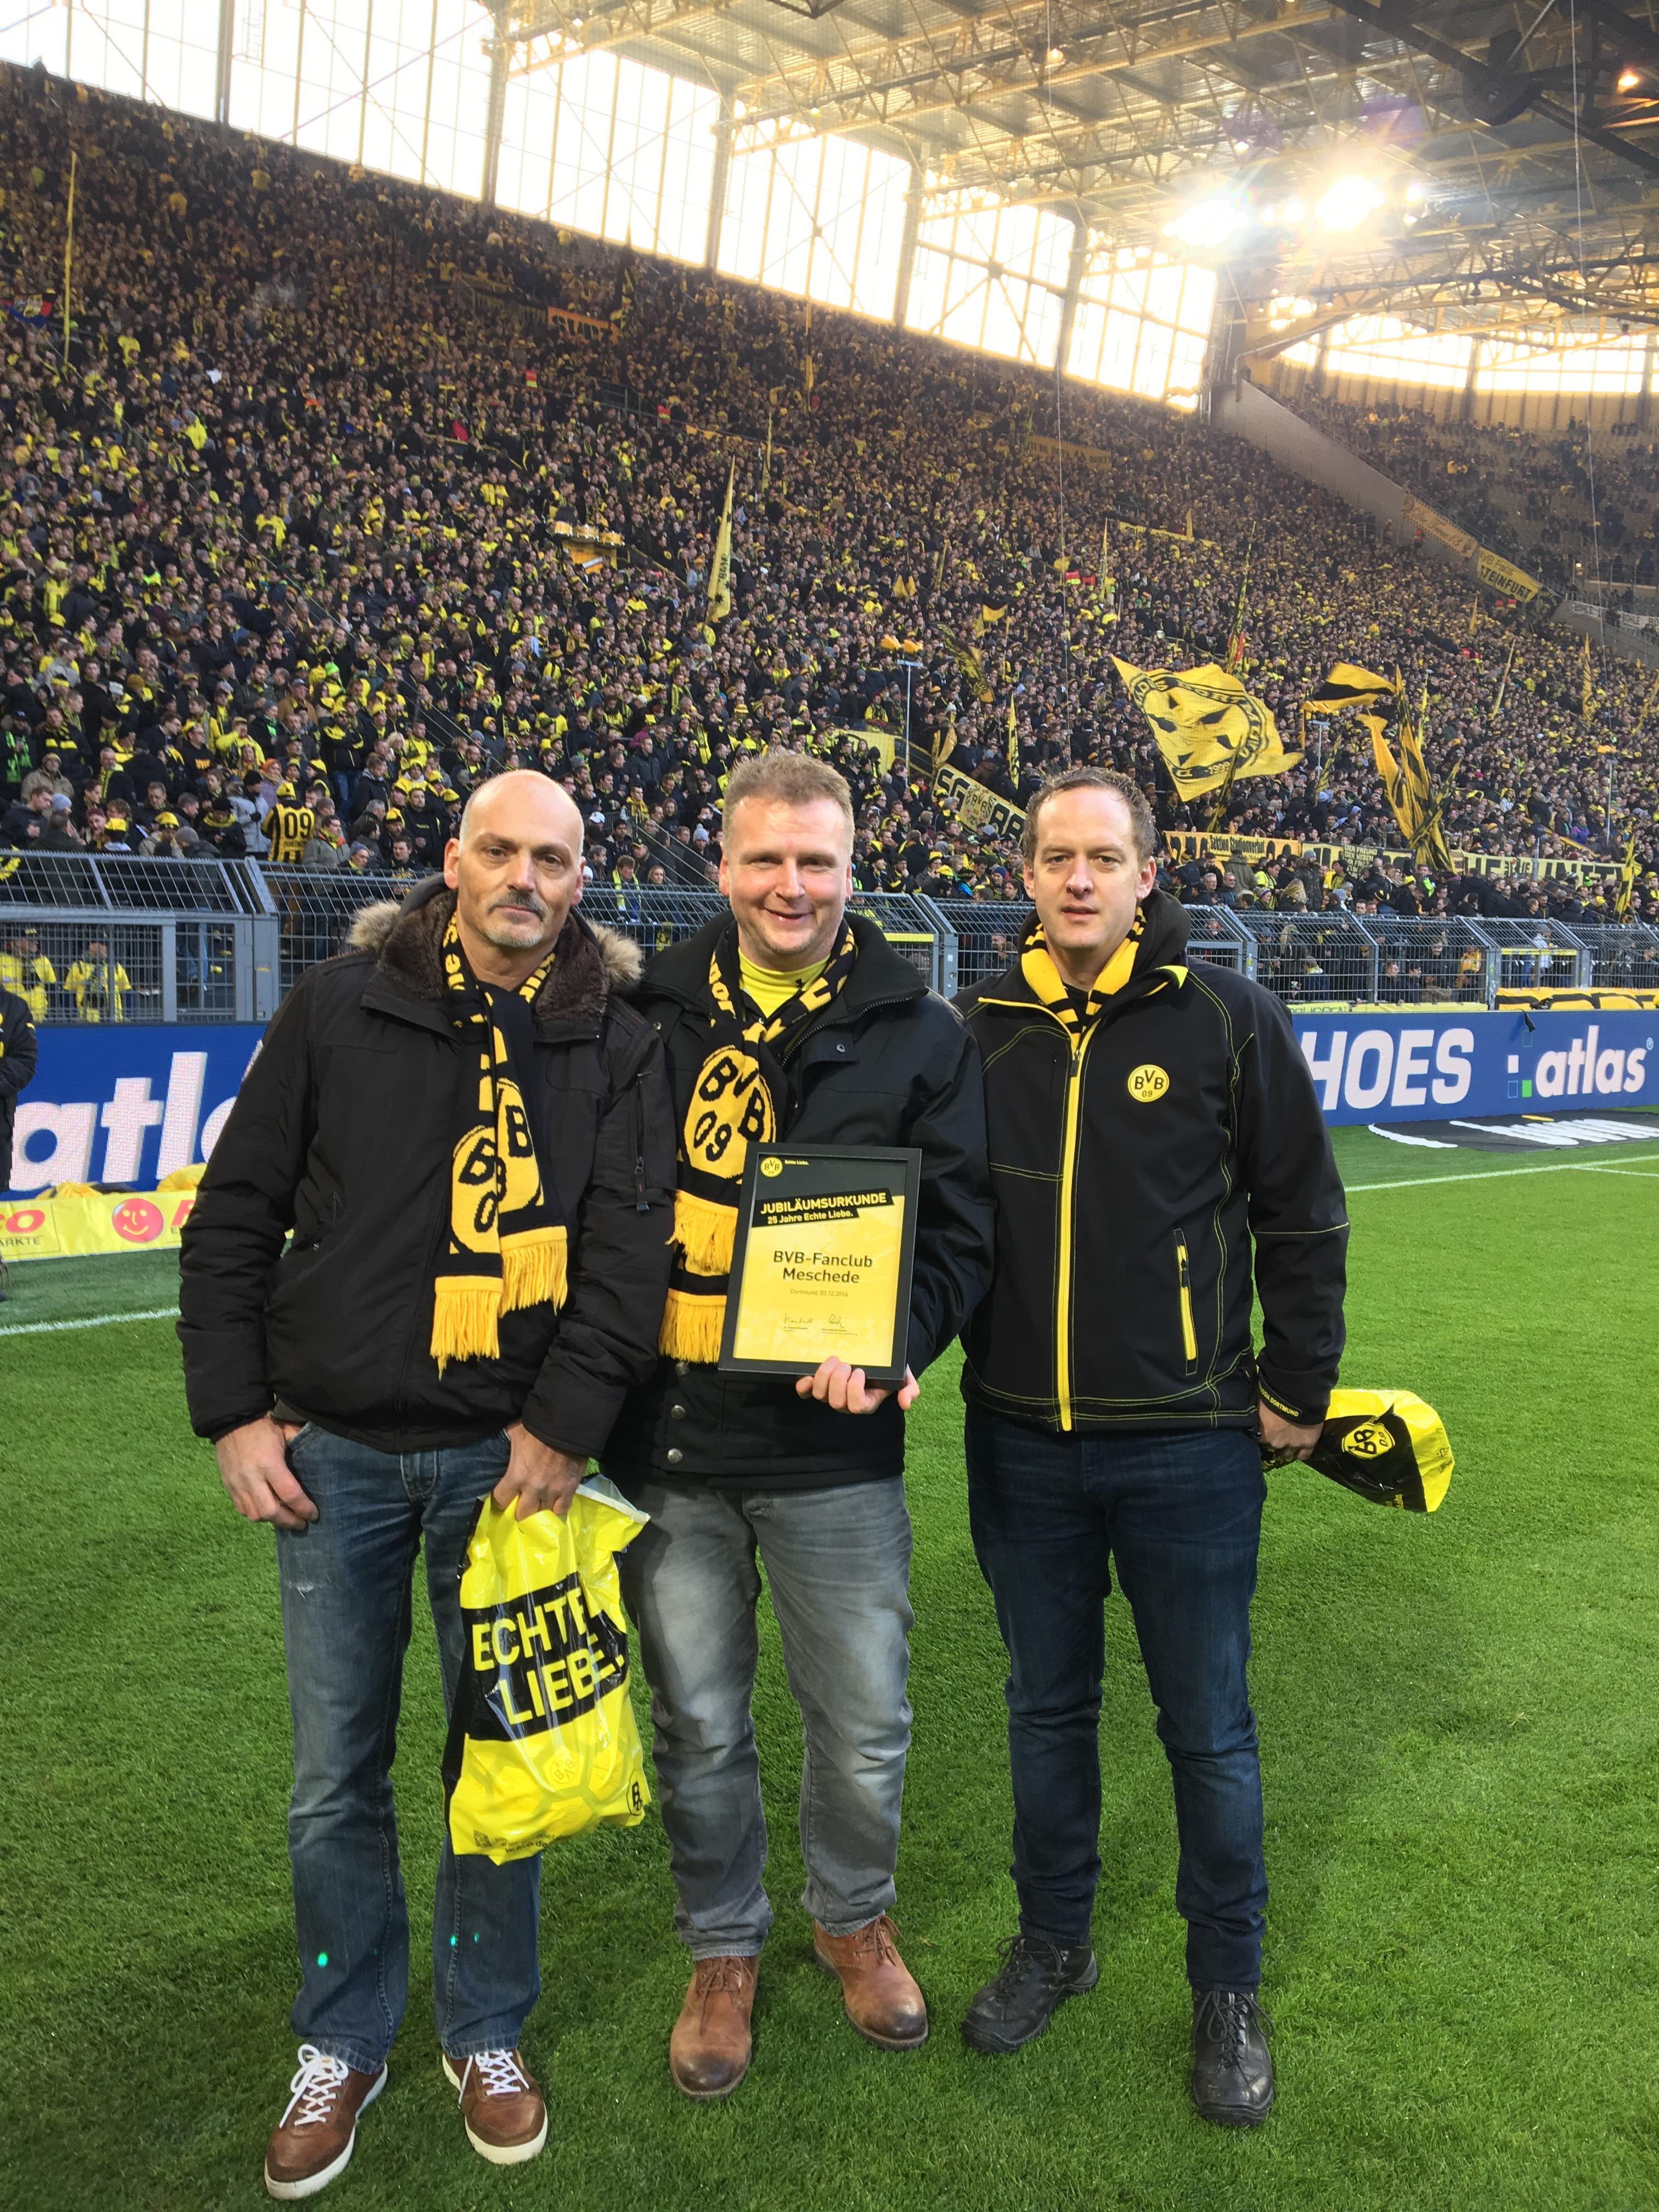 25 Jahre BVB-Fanclub Meschede